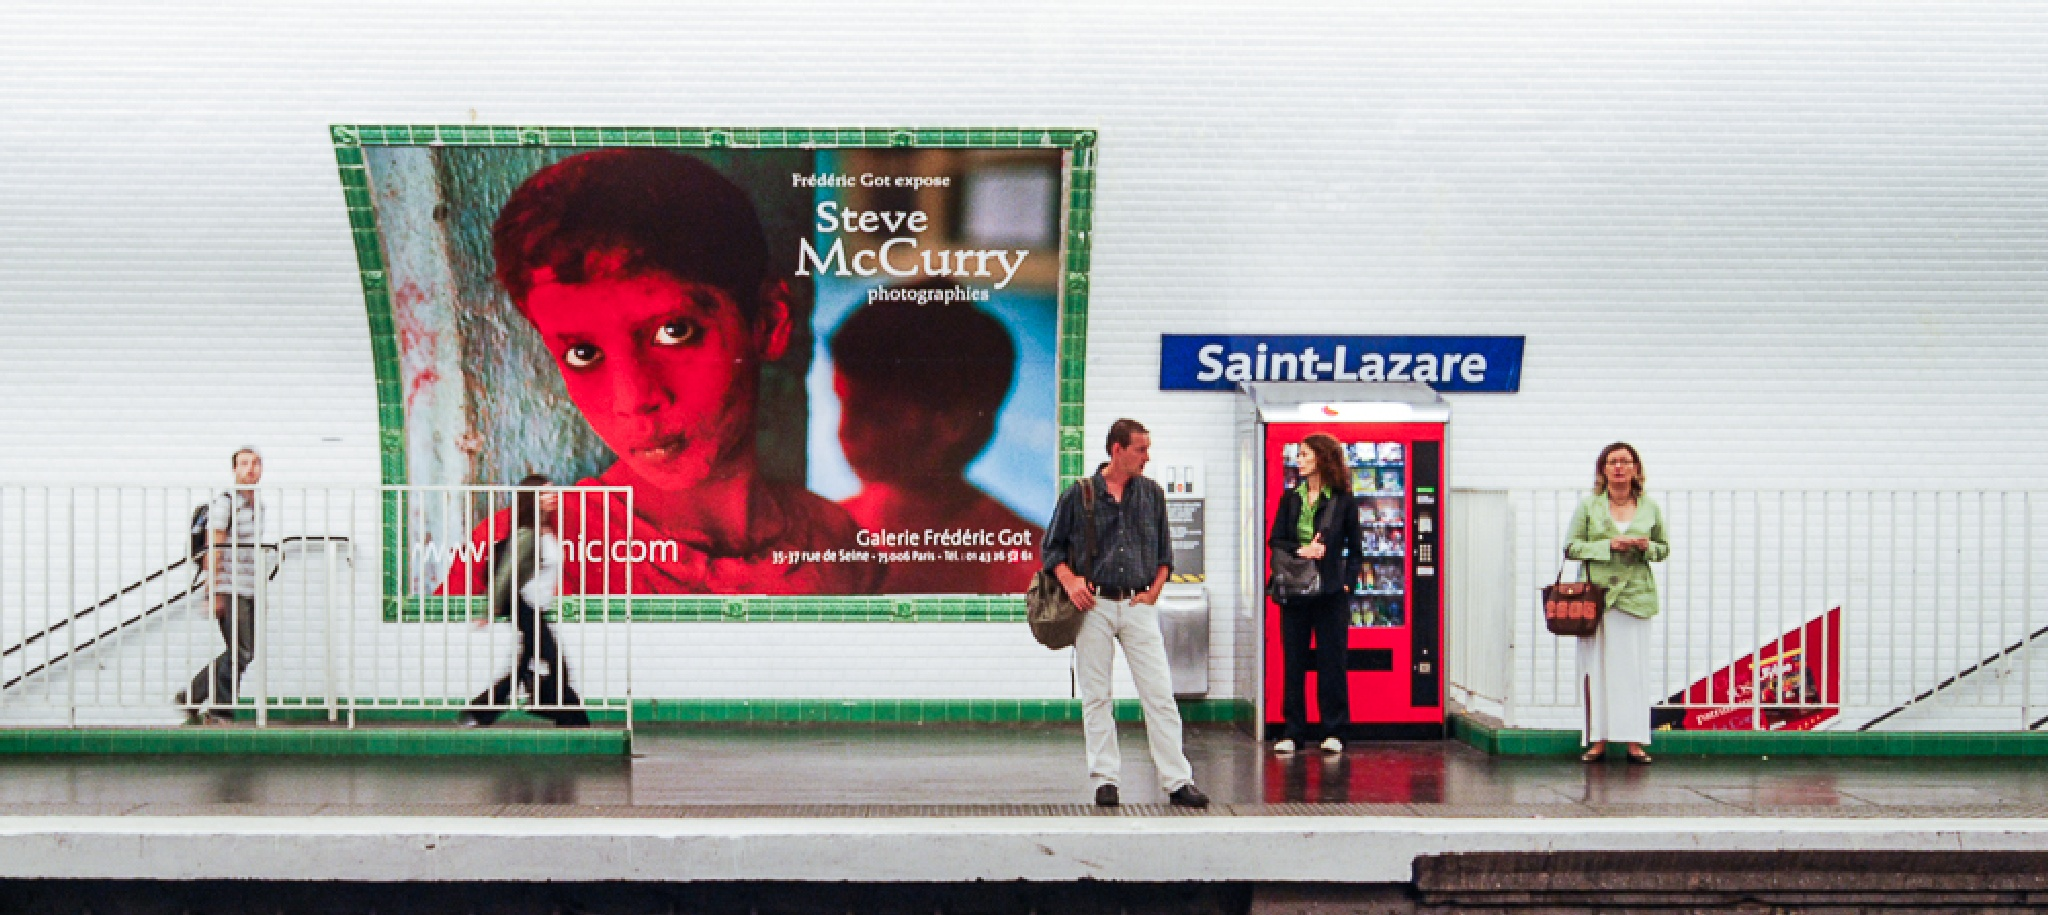 Gare Saint-Lazare by http://opponenterna.photoshelter.com/archive